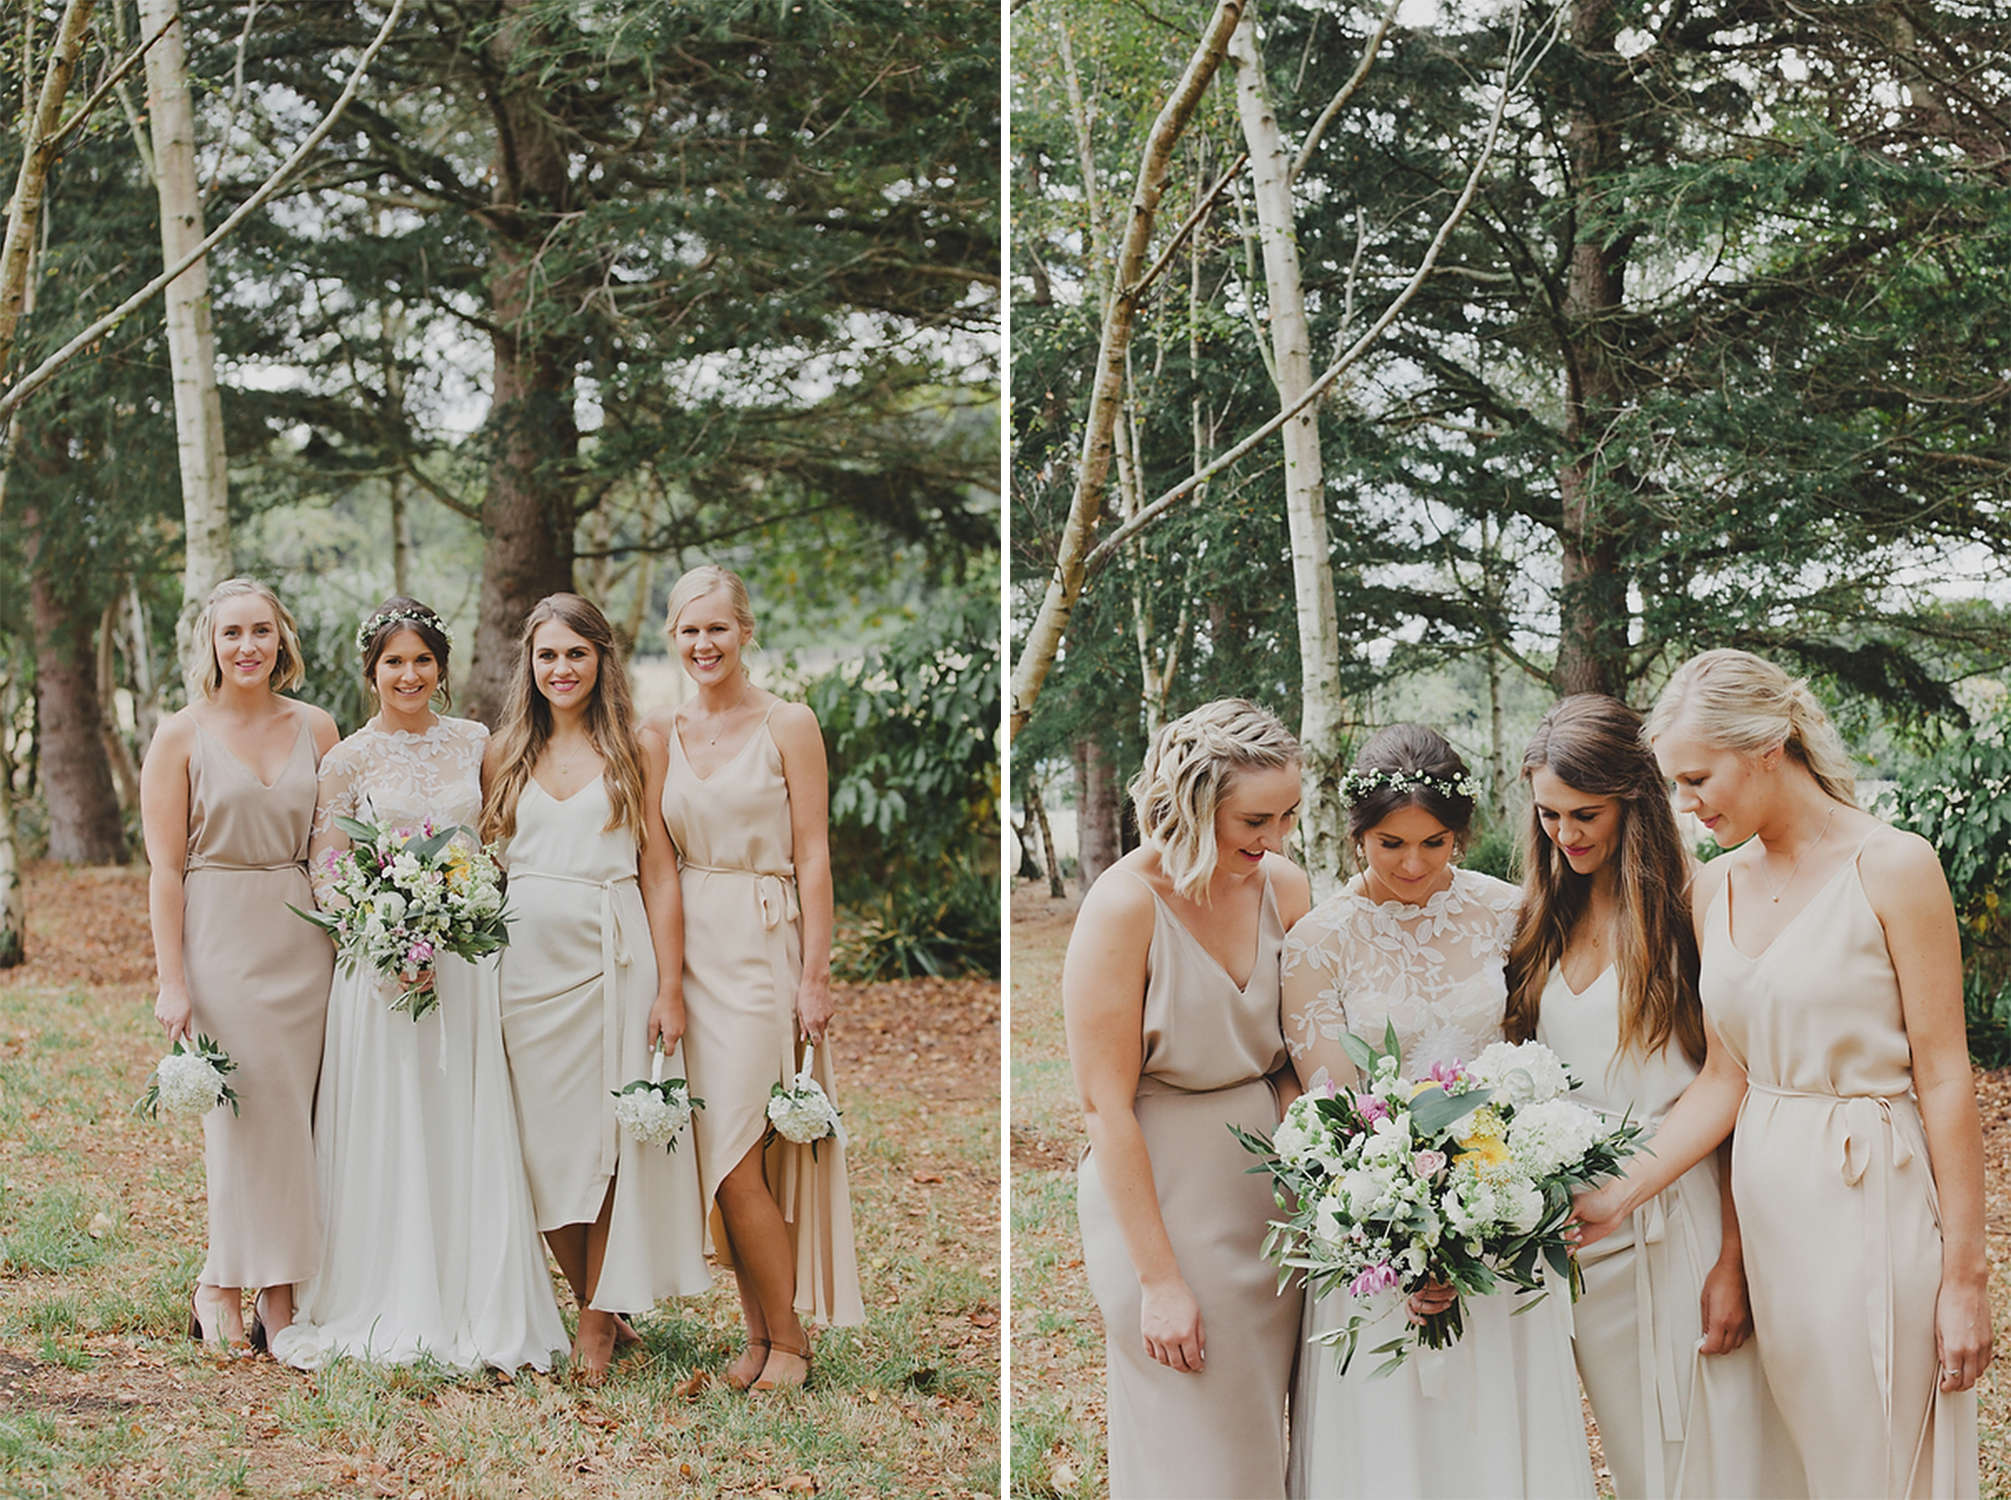 wellington wedding photography NZ - 1095.JPG